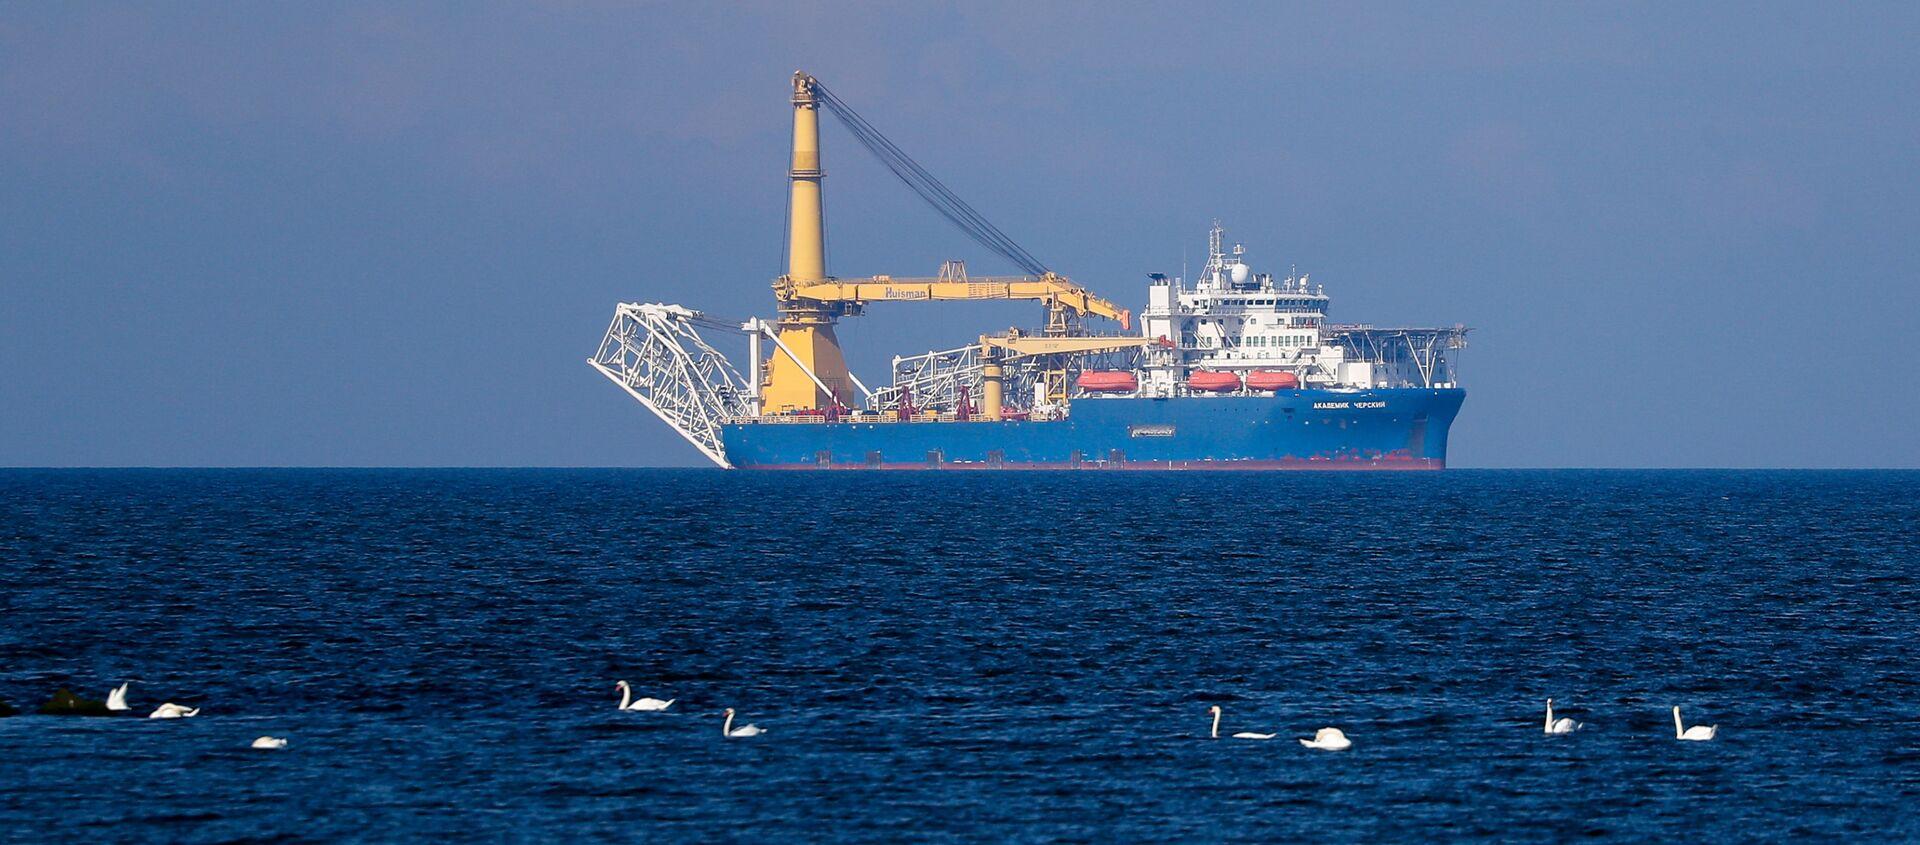 The Russian pipelaying vessel Akademik Cherskiy is pictured in the waters of Kaliningrad, Russia. - Sputnik International, 1920, 09.03.2021